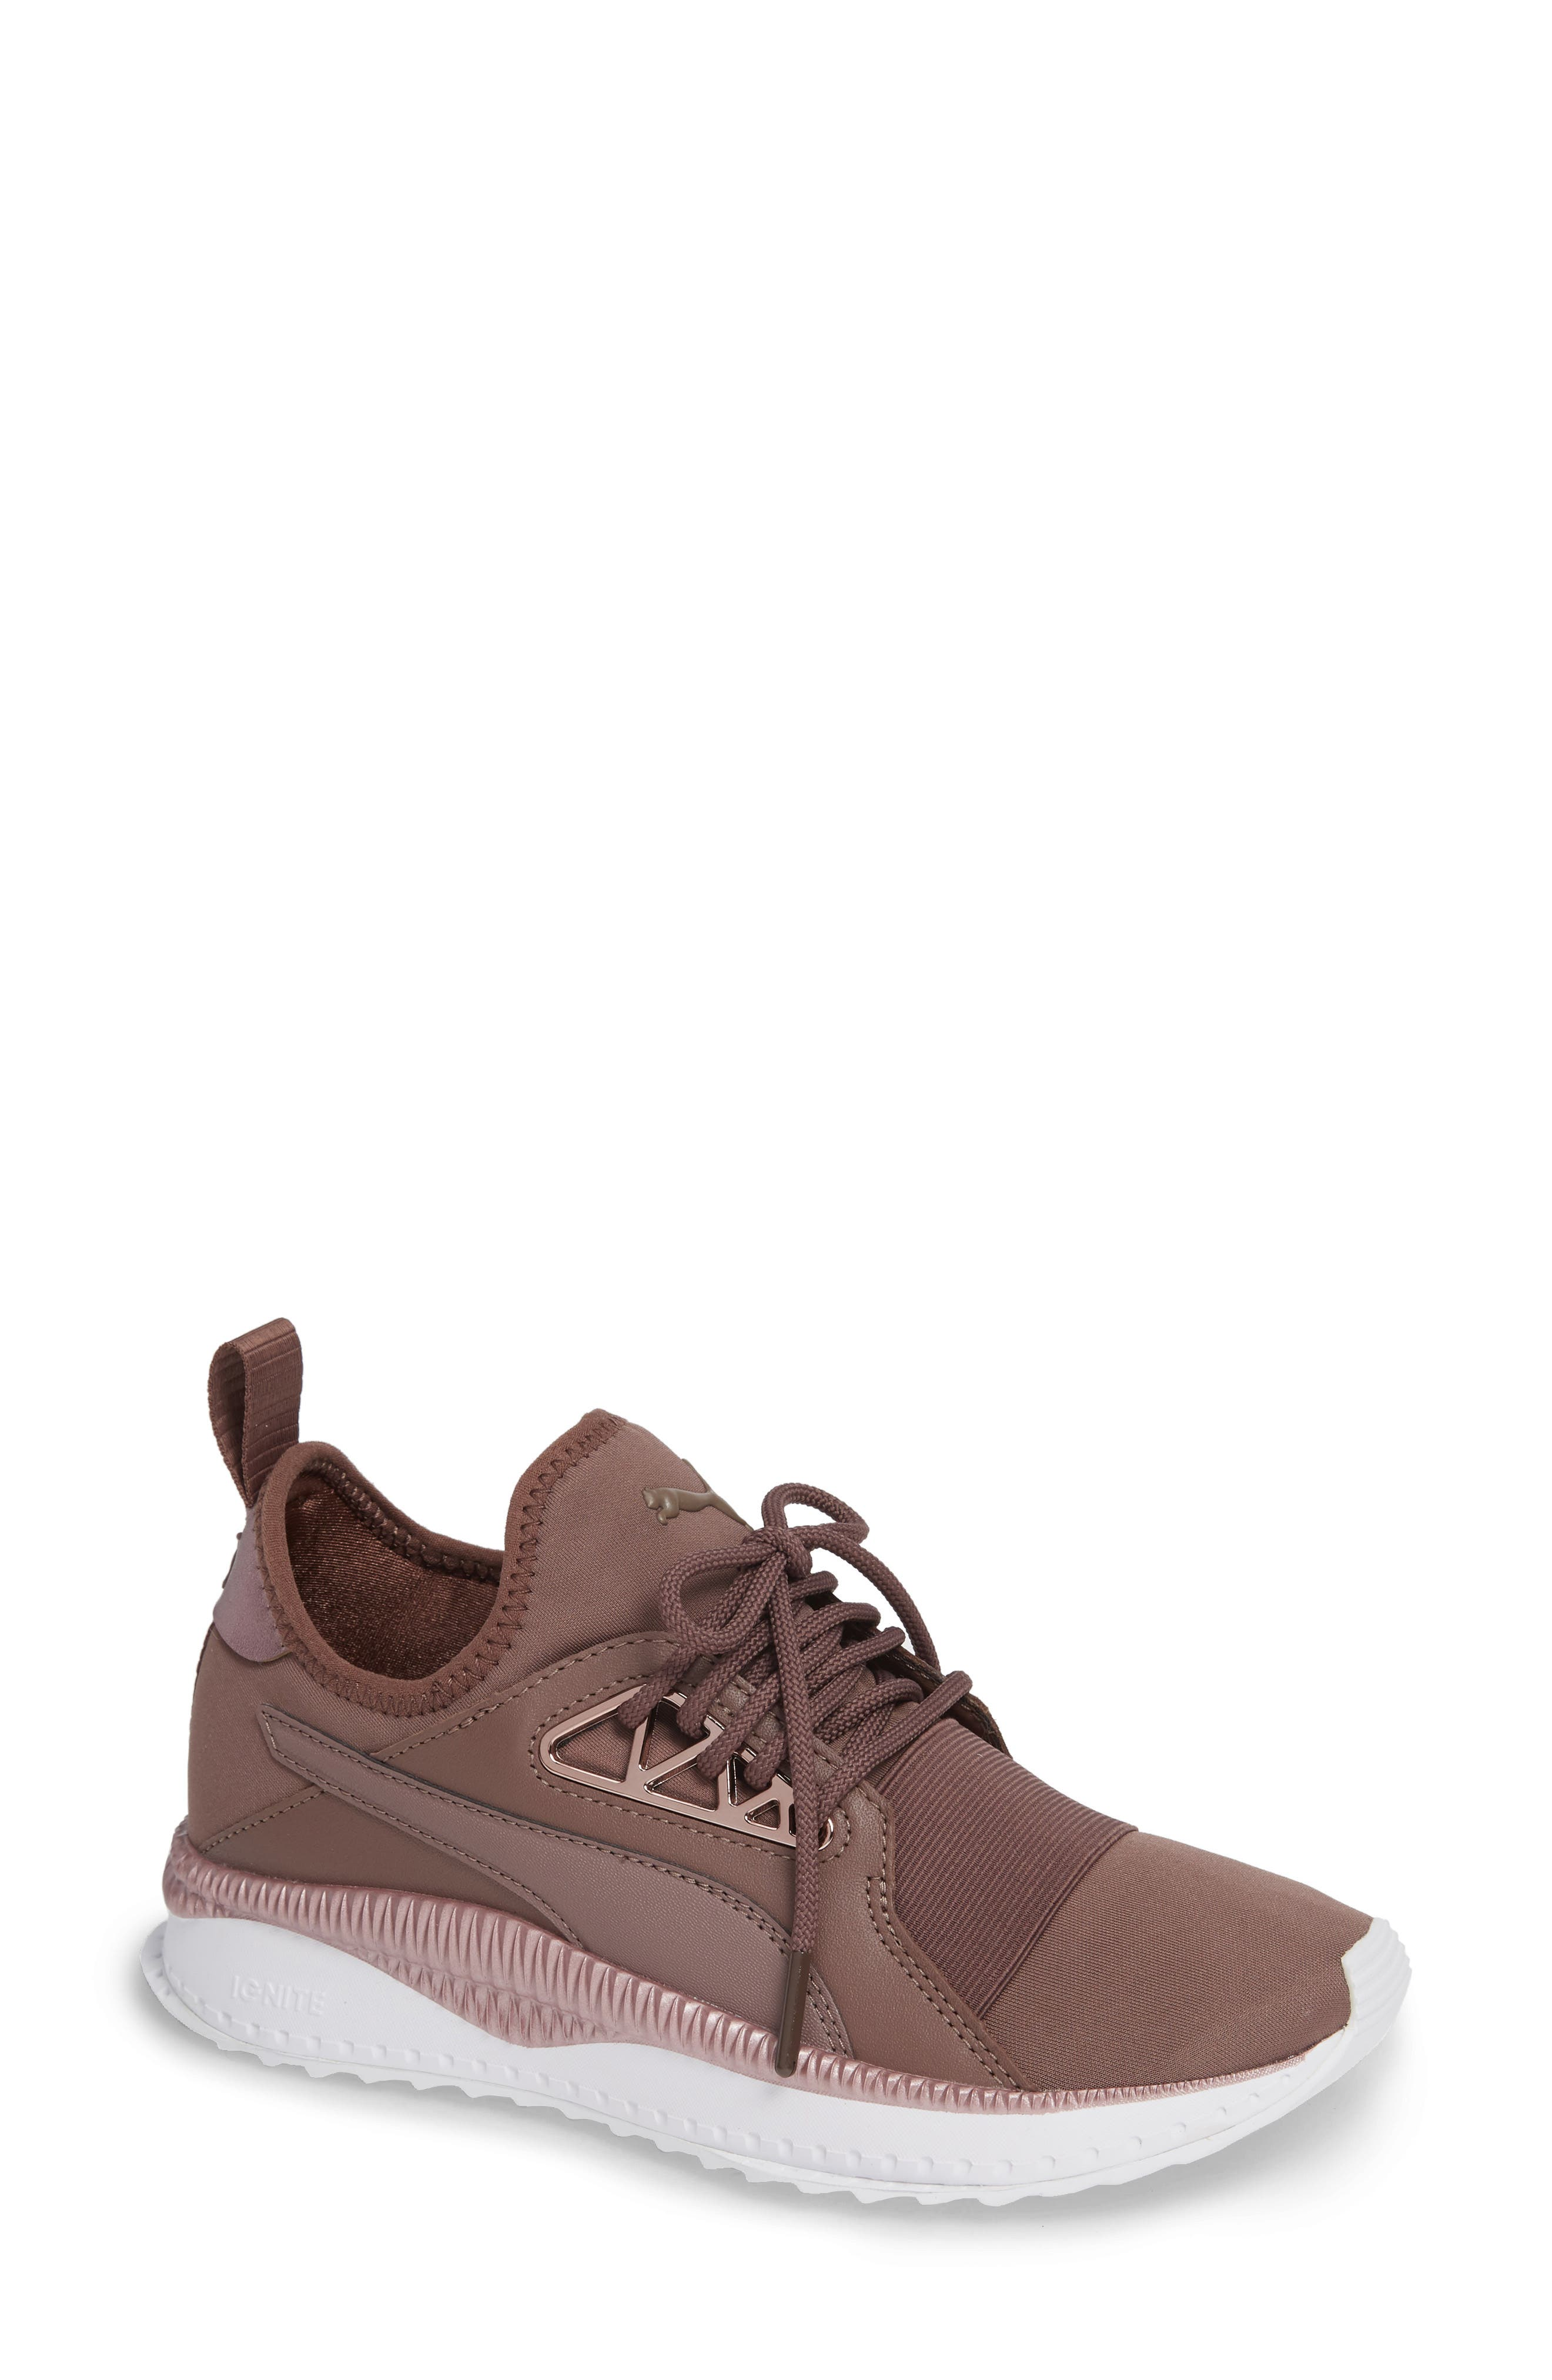 PUMA | TSUGI Apex Jewel Sneaker